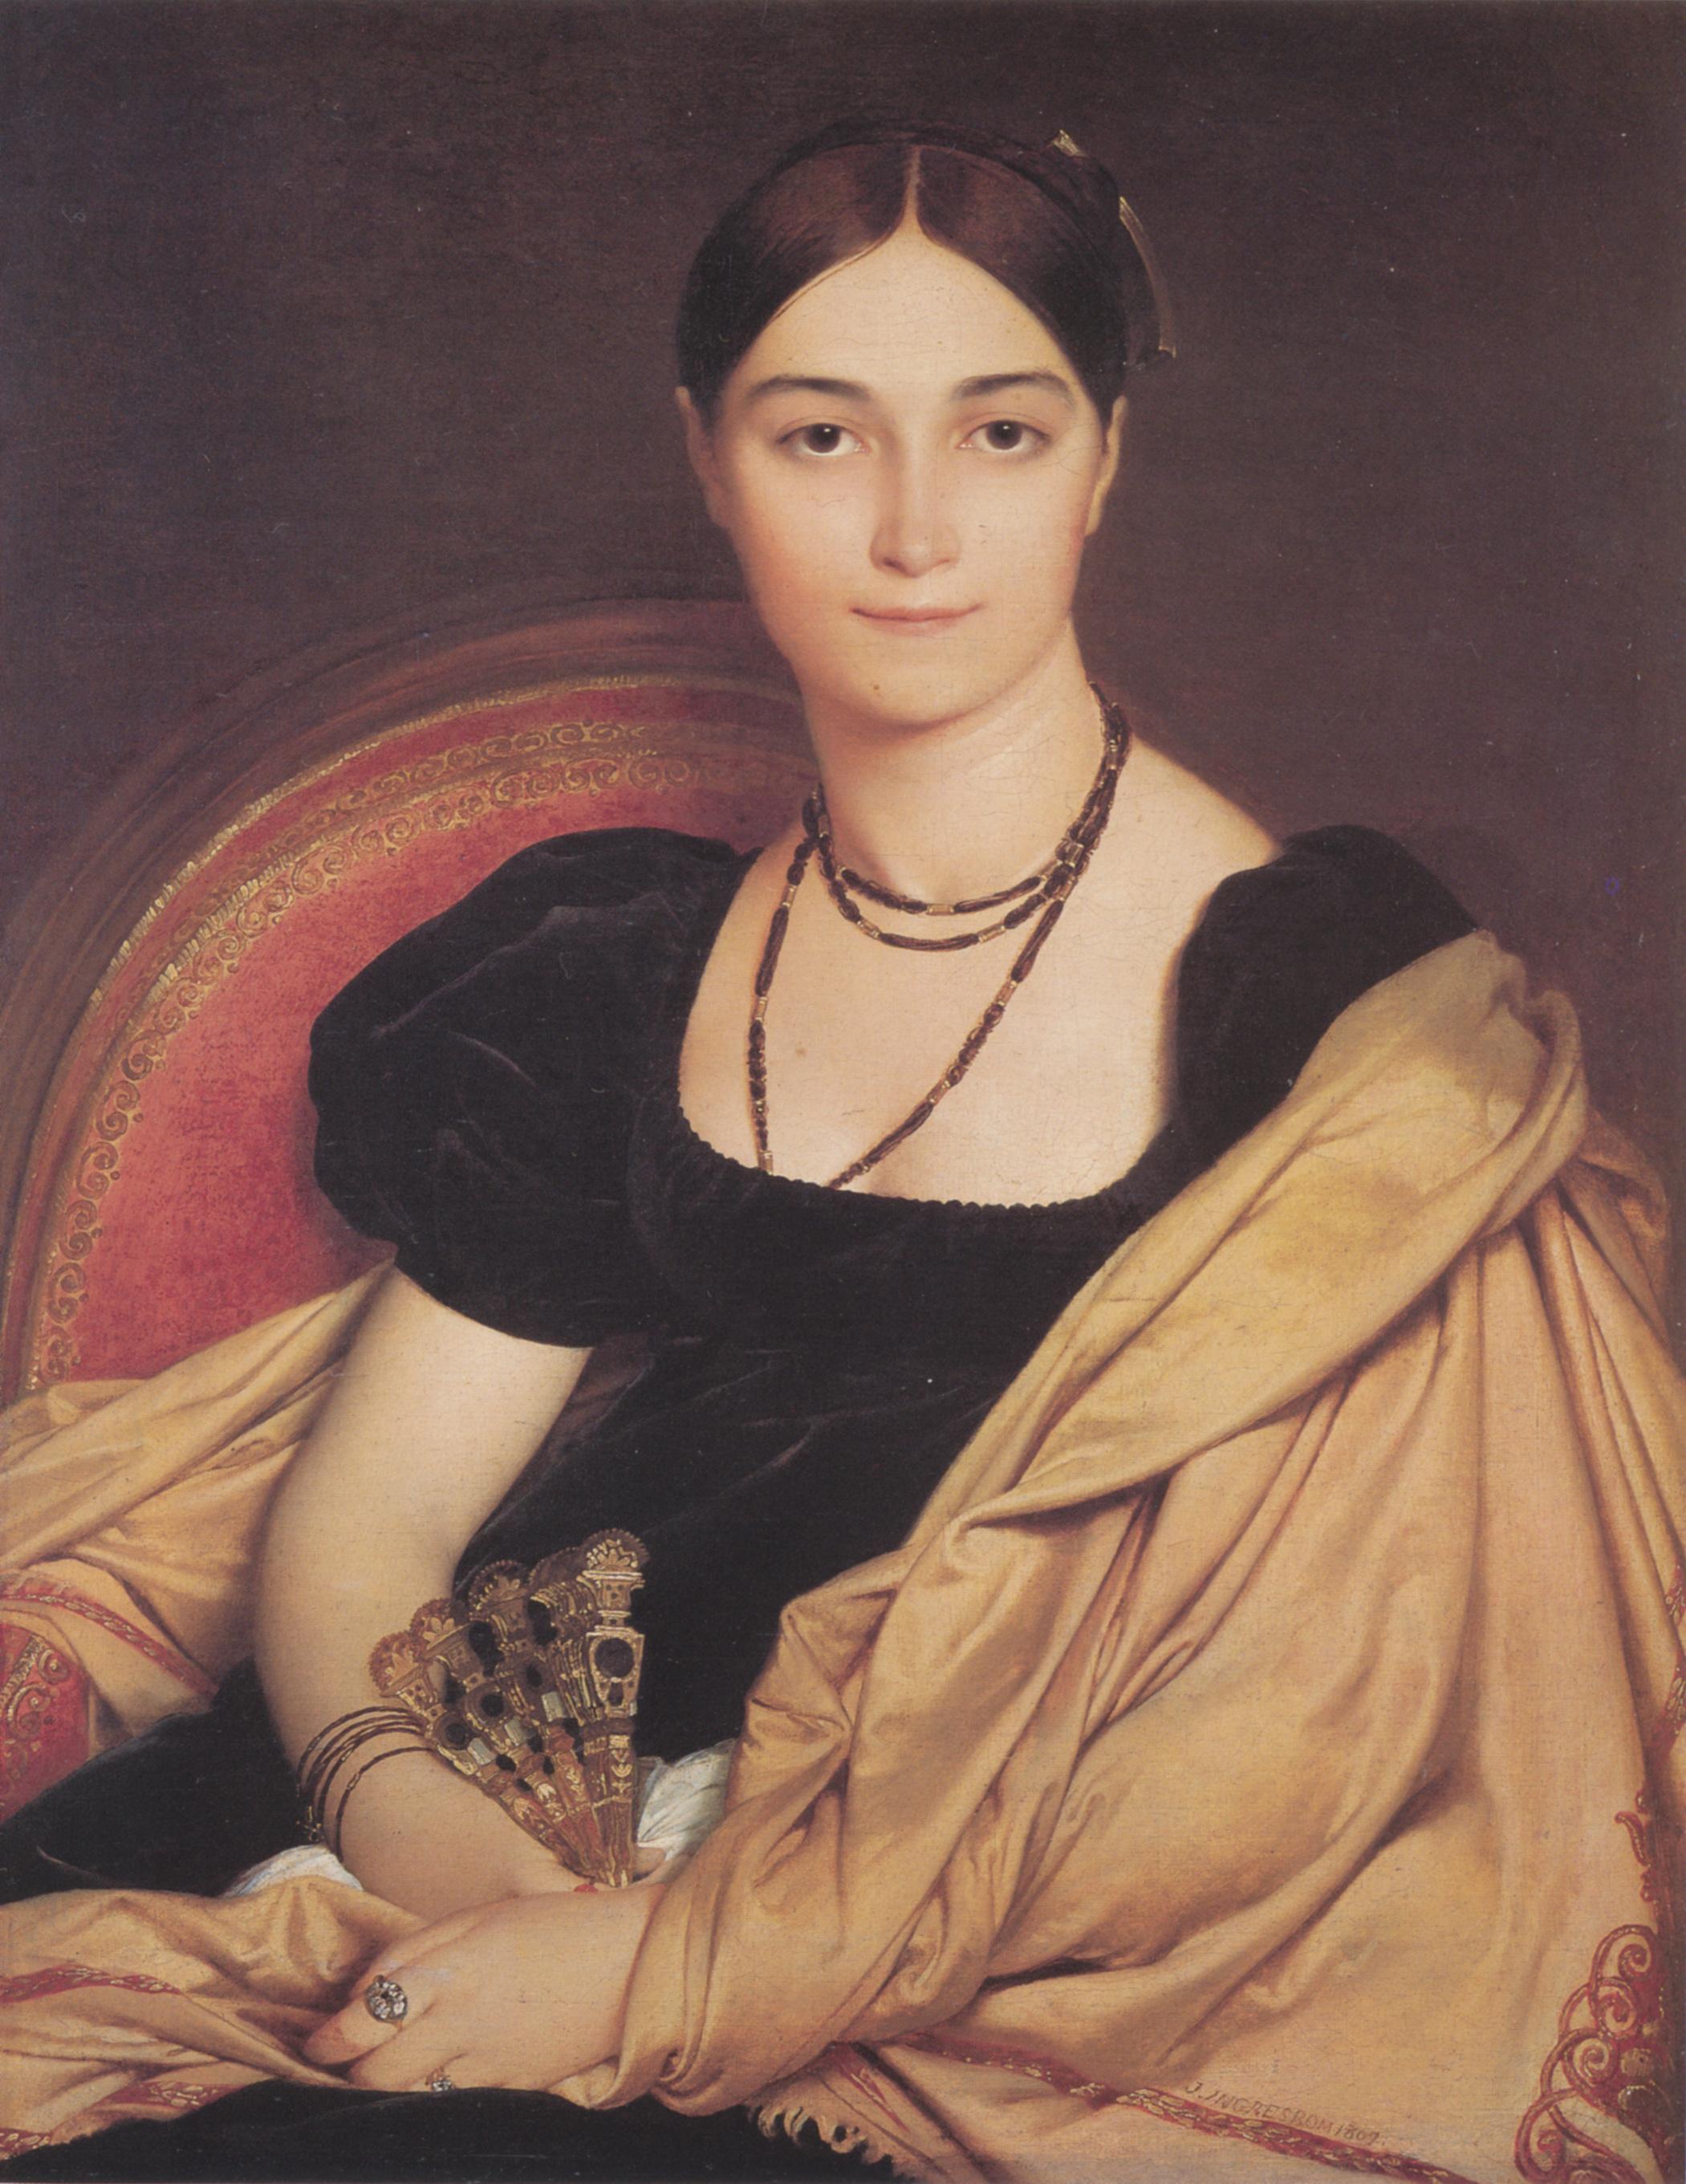 Portrait of Madame Antonia de Vaucay nee de Nittis, 1807